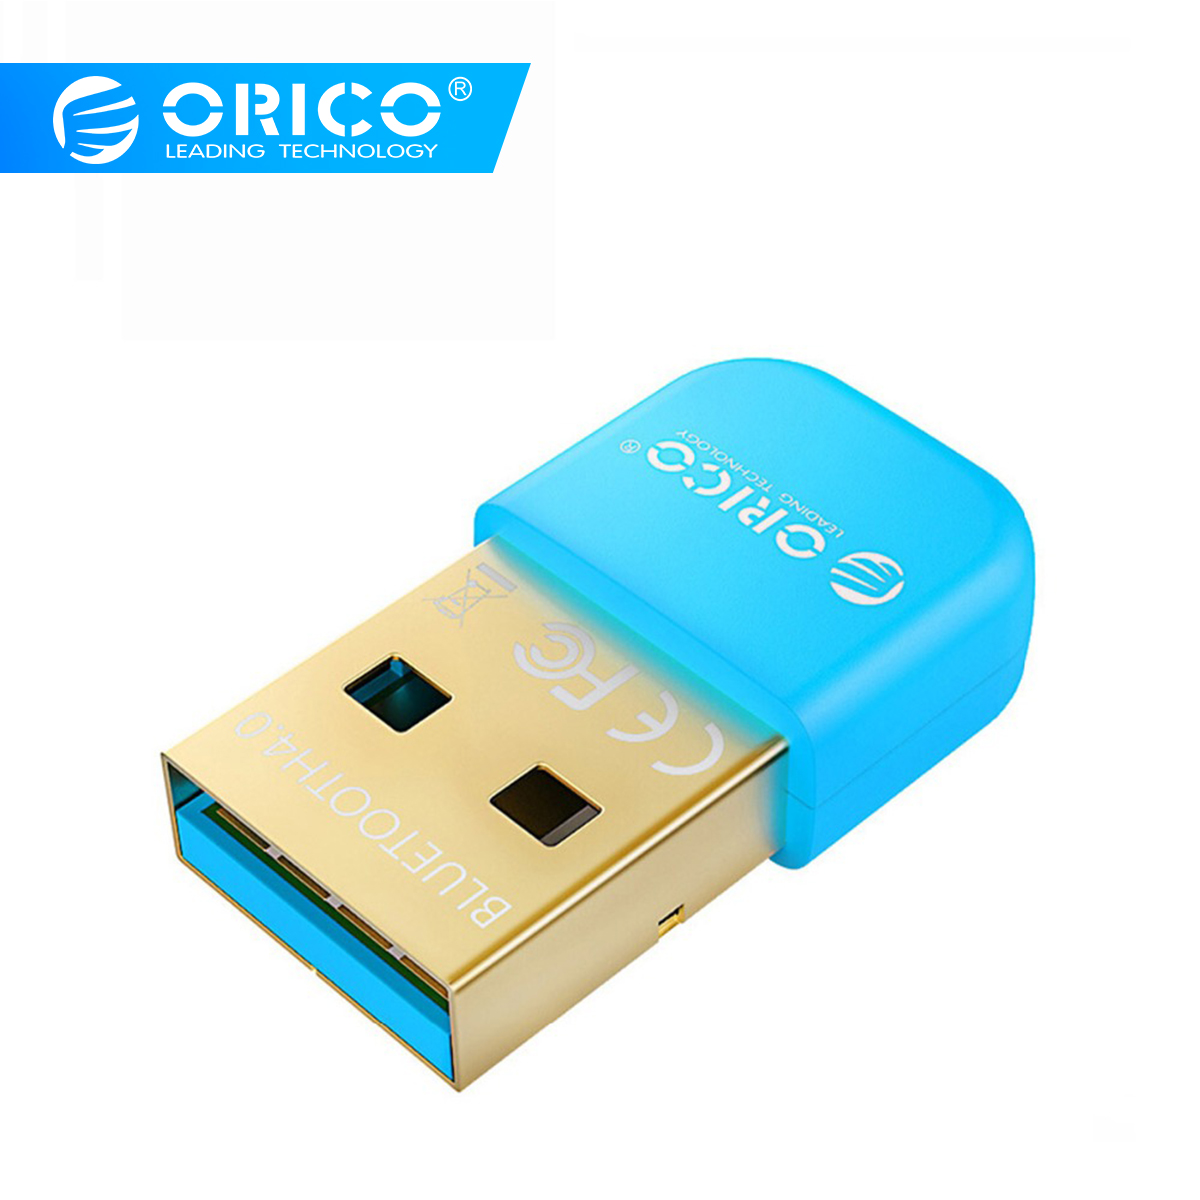 ORICO BT 4.0 Adapter Dongle USB 2.0 Mini Wireless Bluetooth Transmitter Receiver